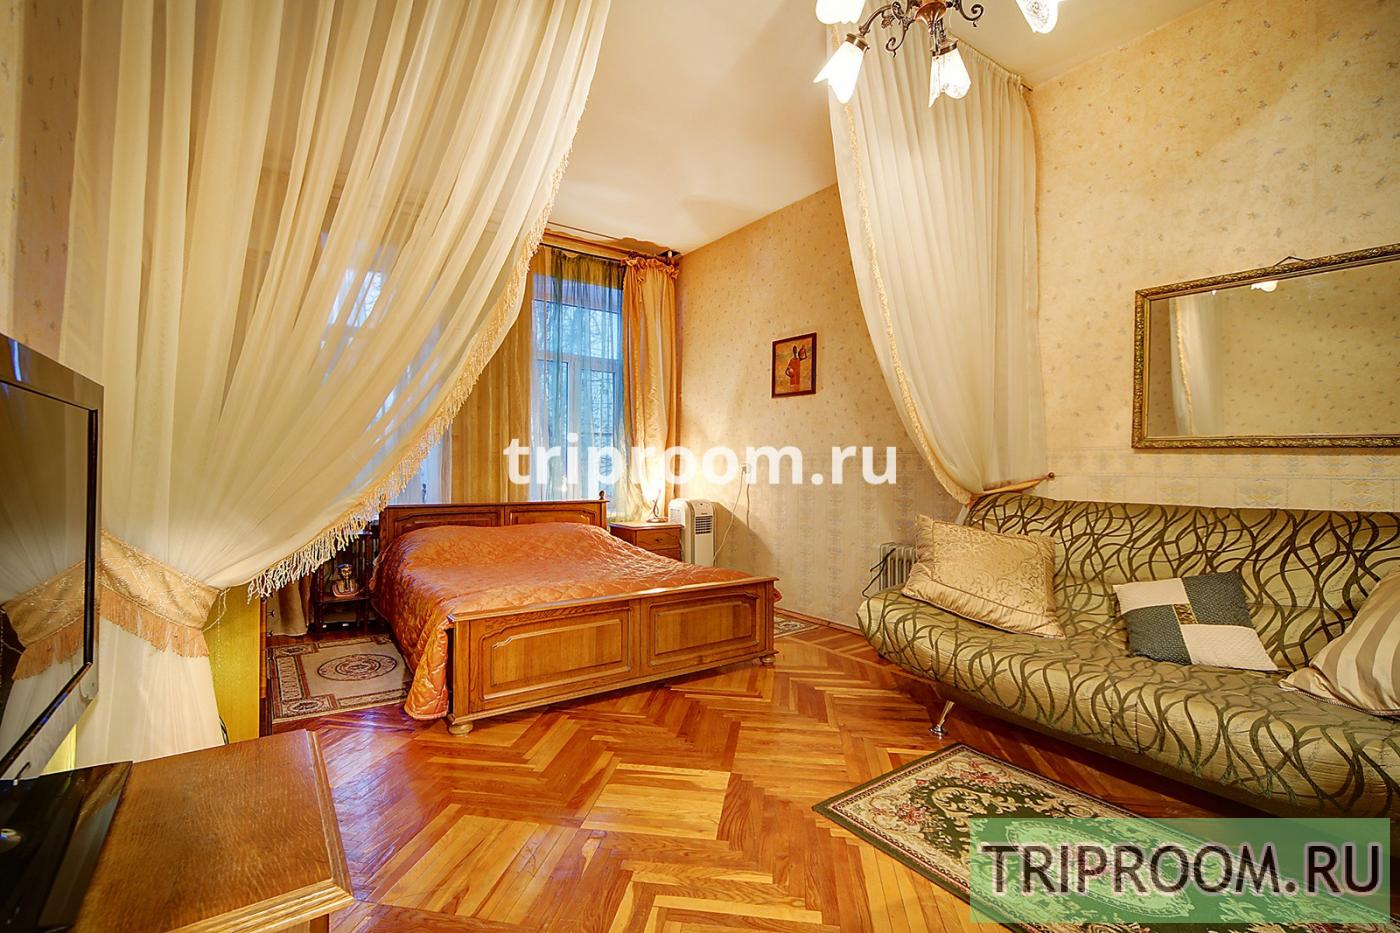 1-комнатная квартира посуточно (вариант № 15445), ул. Лиговский проспект, фото № 2